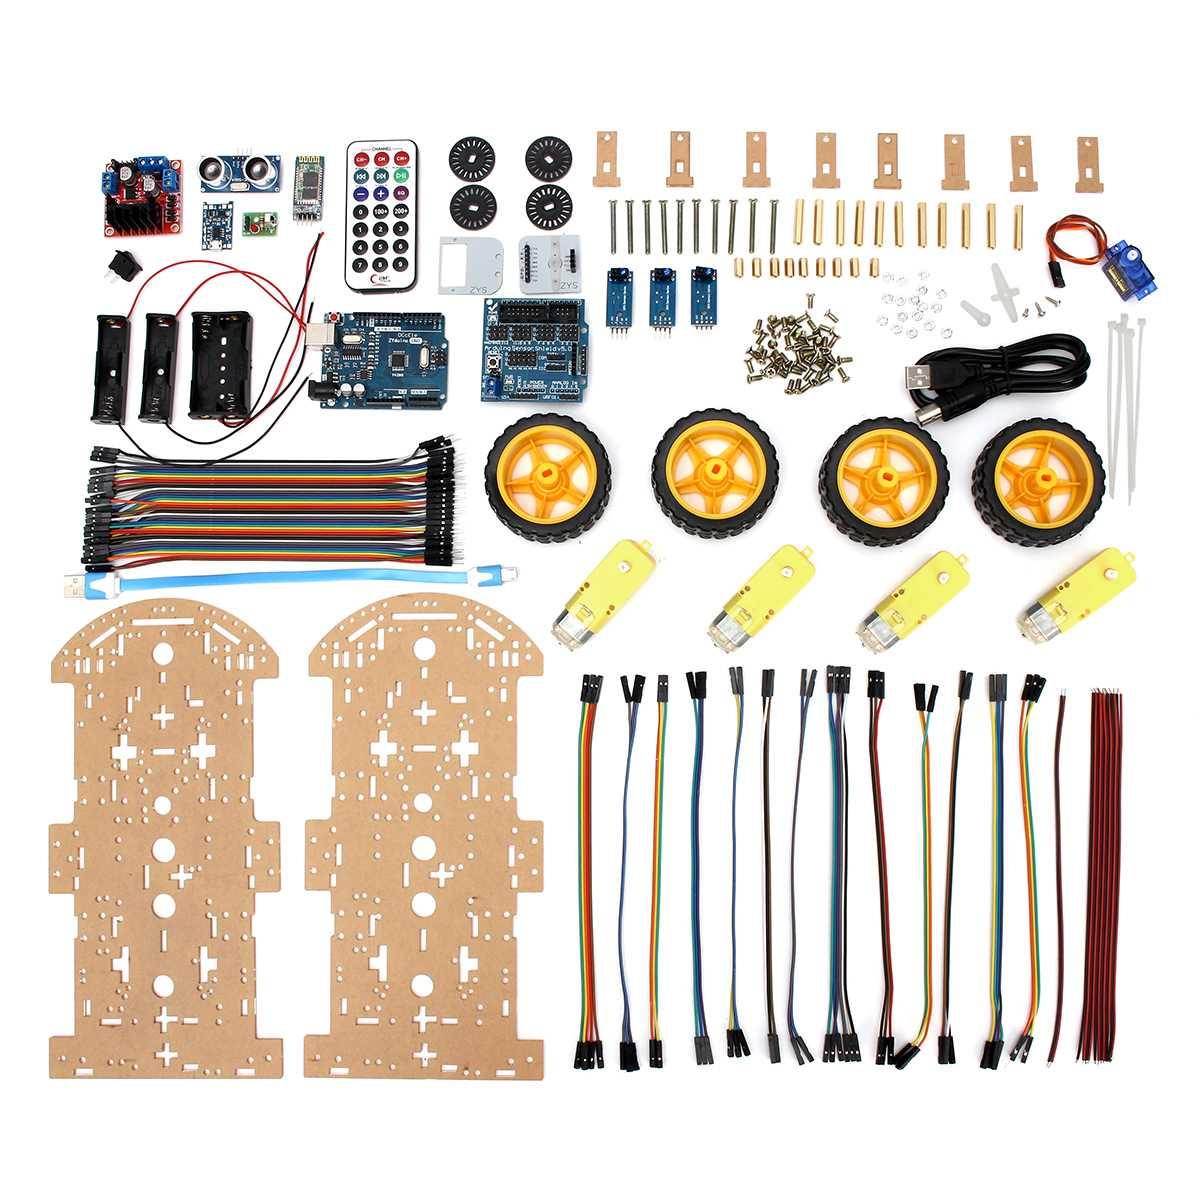 Kits de chasis de coche inteligente Robot 4WD, Motor de seguimiento de evitación con codificador de velocidad para Arduino, Kit de coche inteligente Robot Educativo DIY